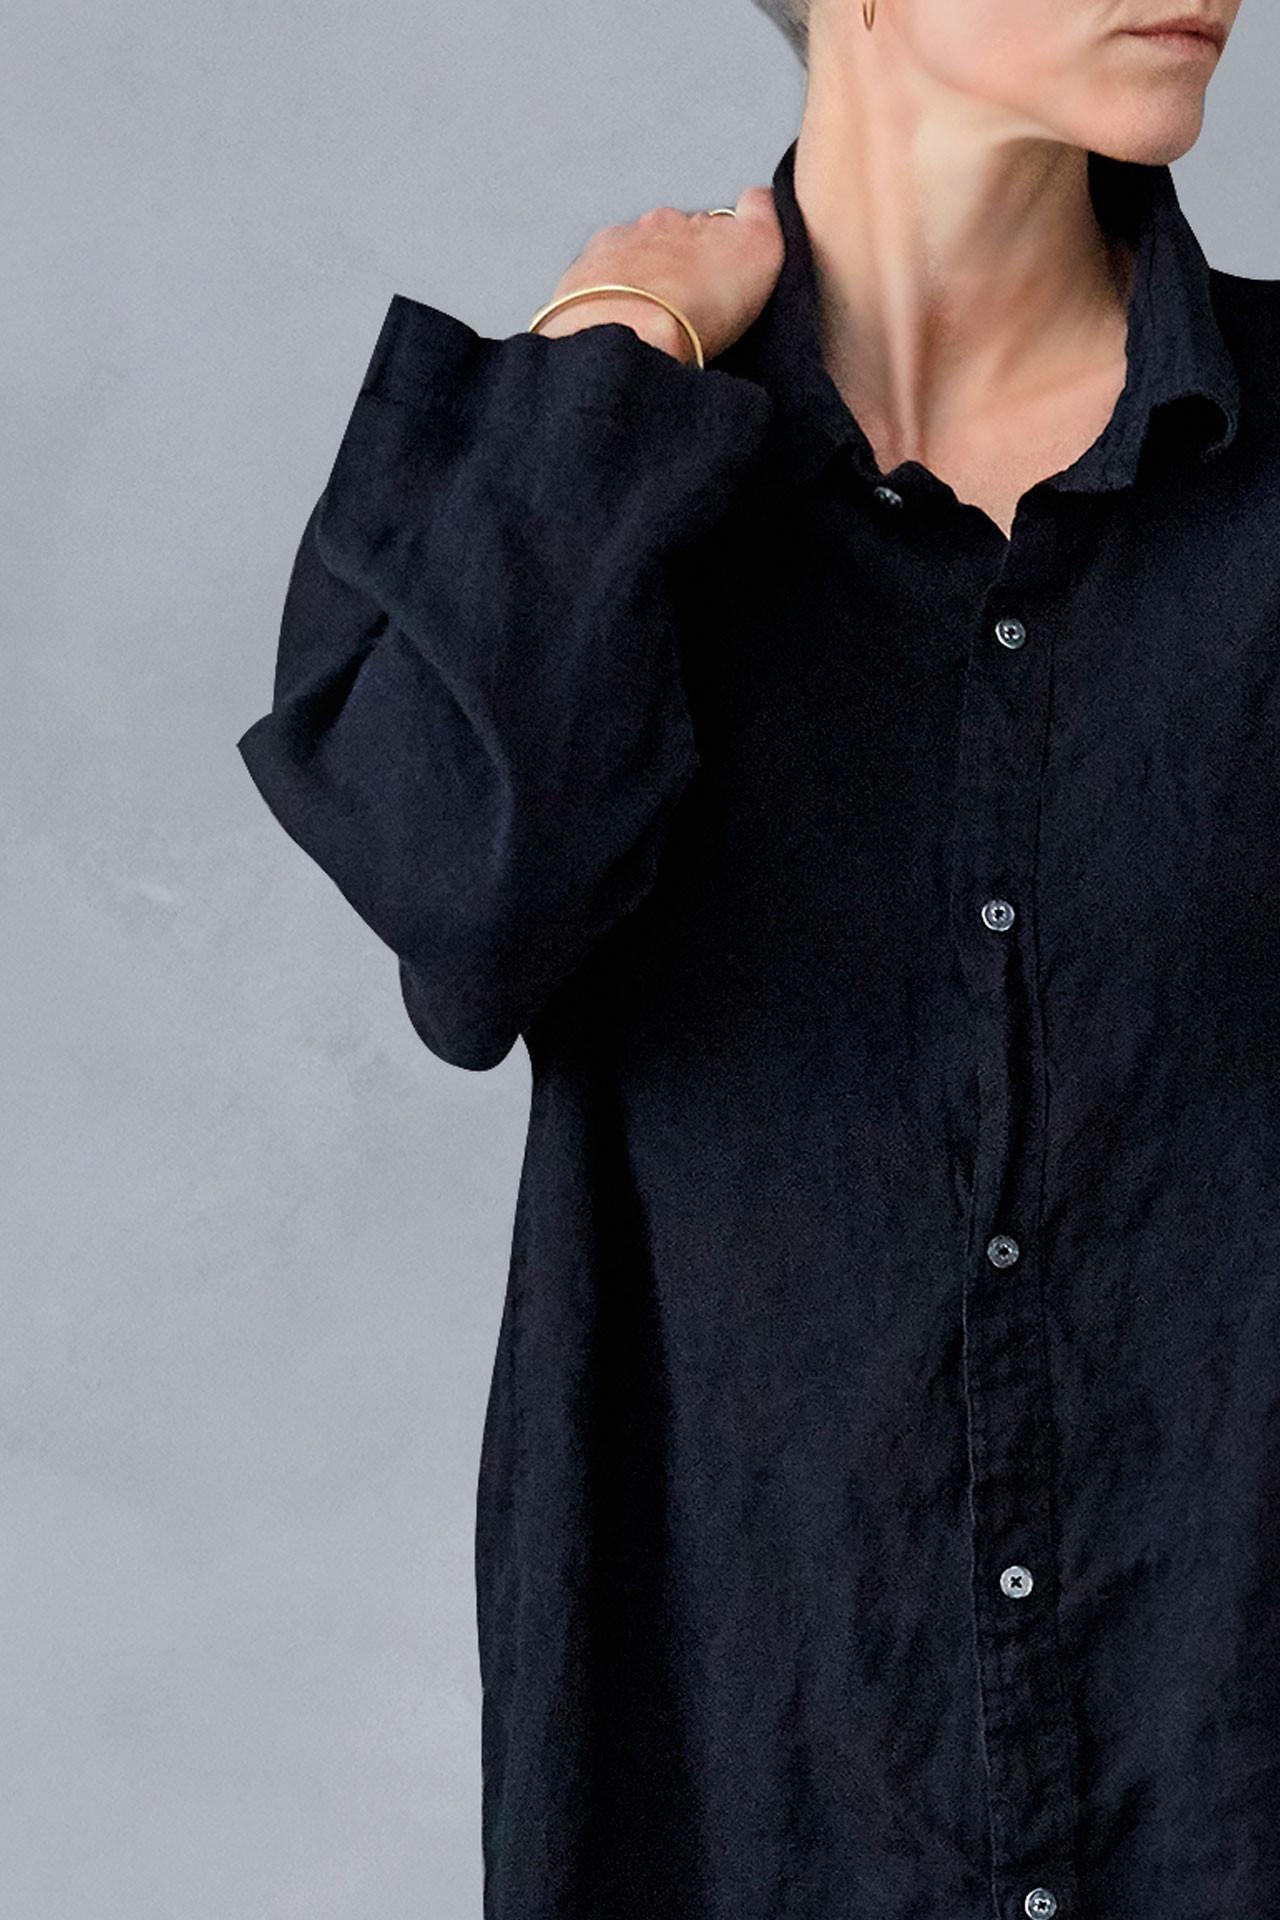 444340ae0da ... Hørskjorte til kvinder fra VIIL, dansk design, tekstiler & slow living